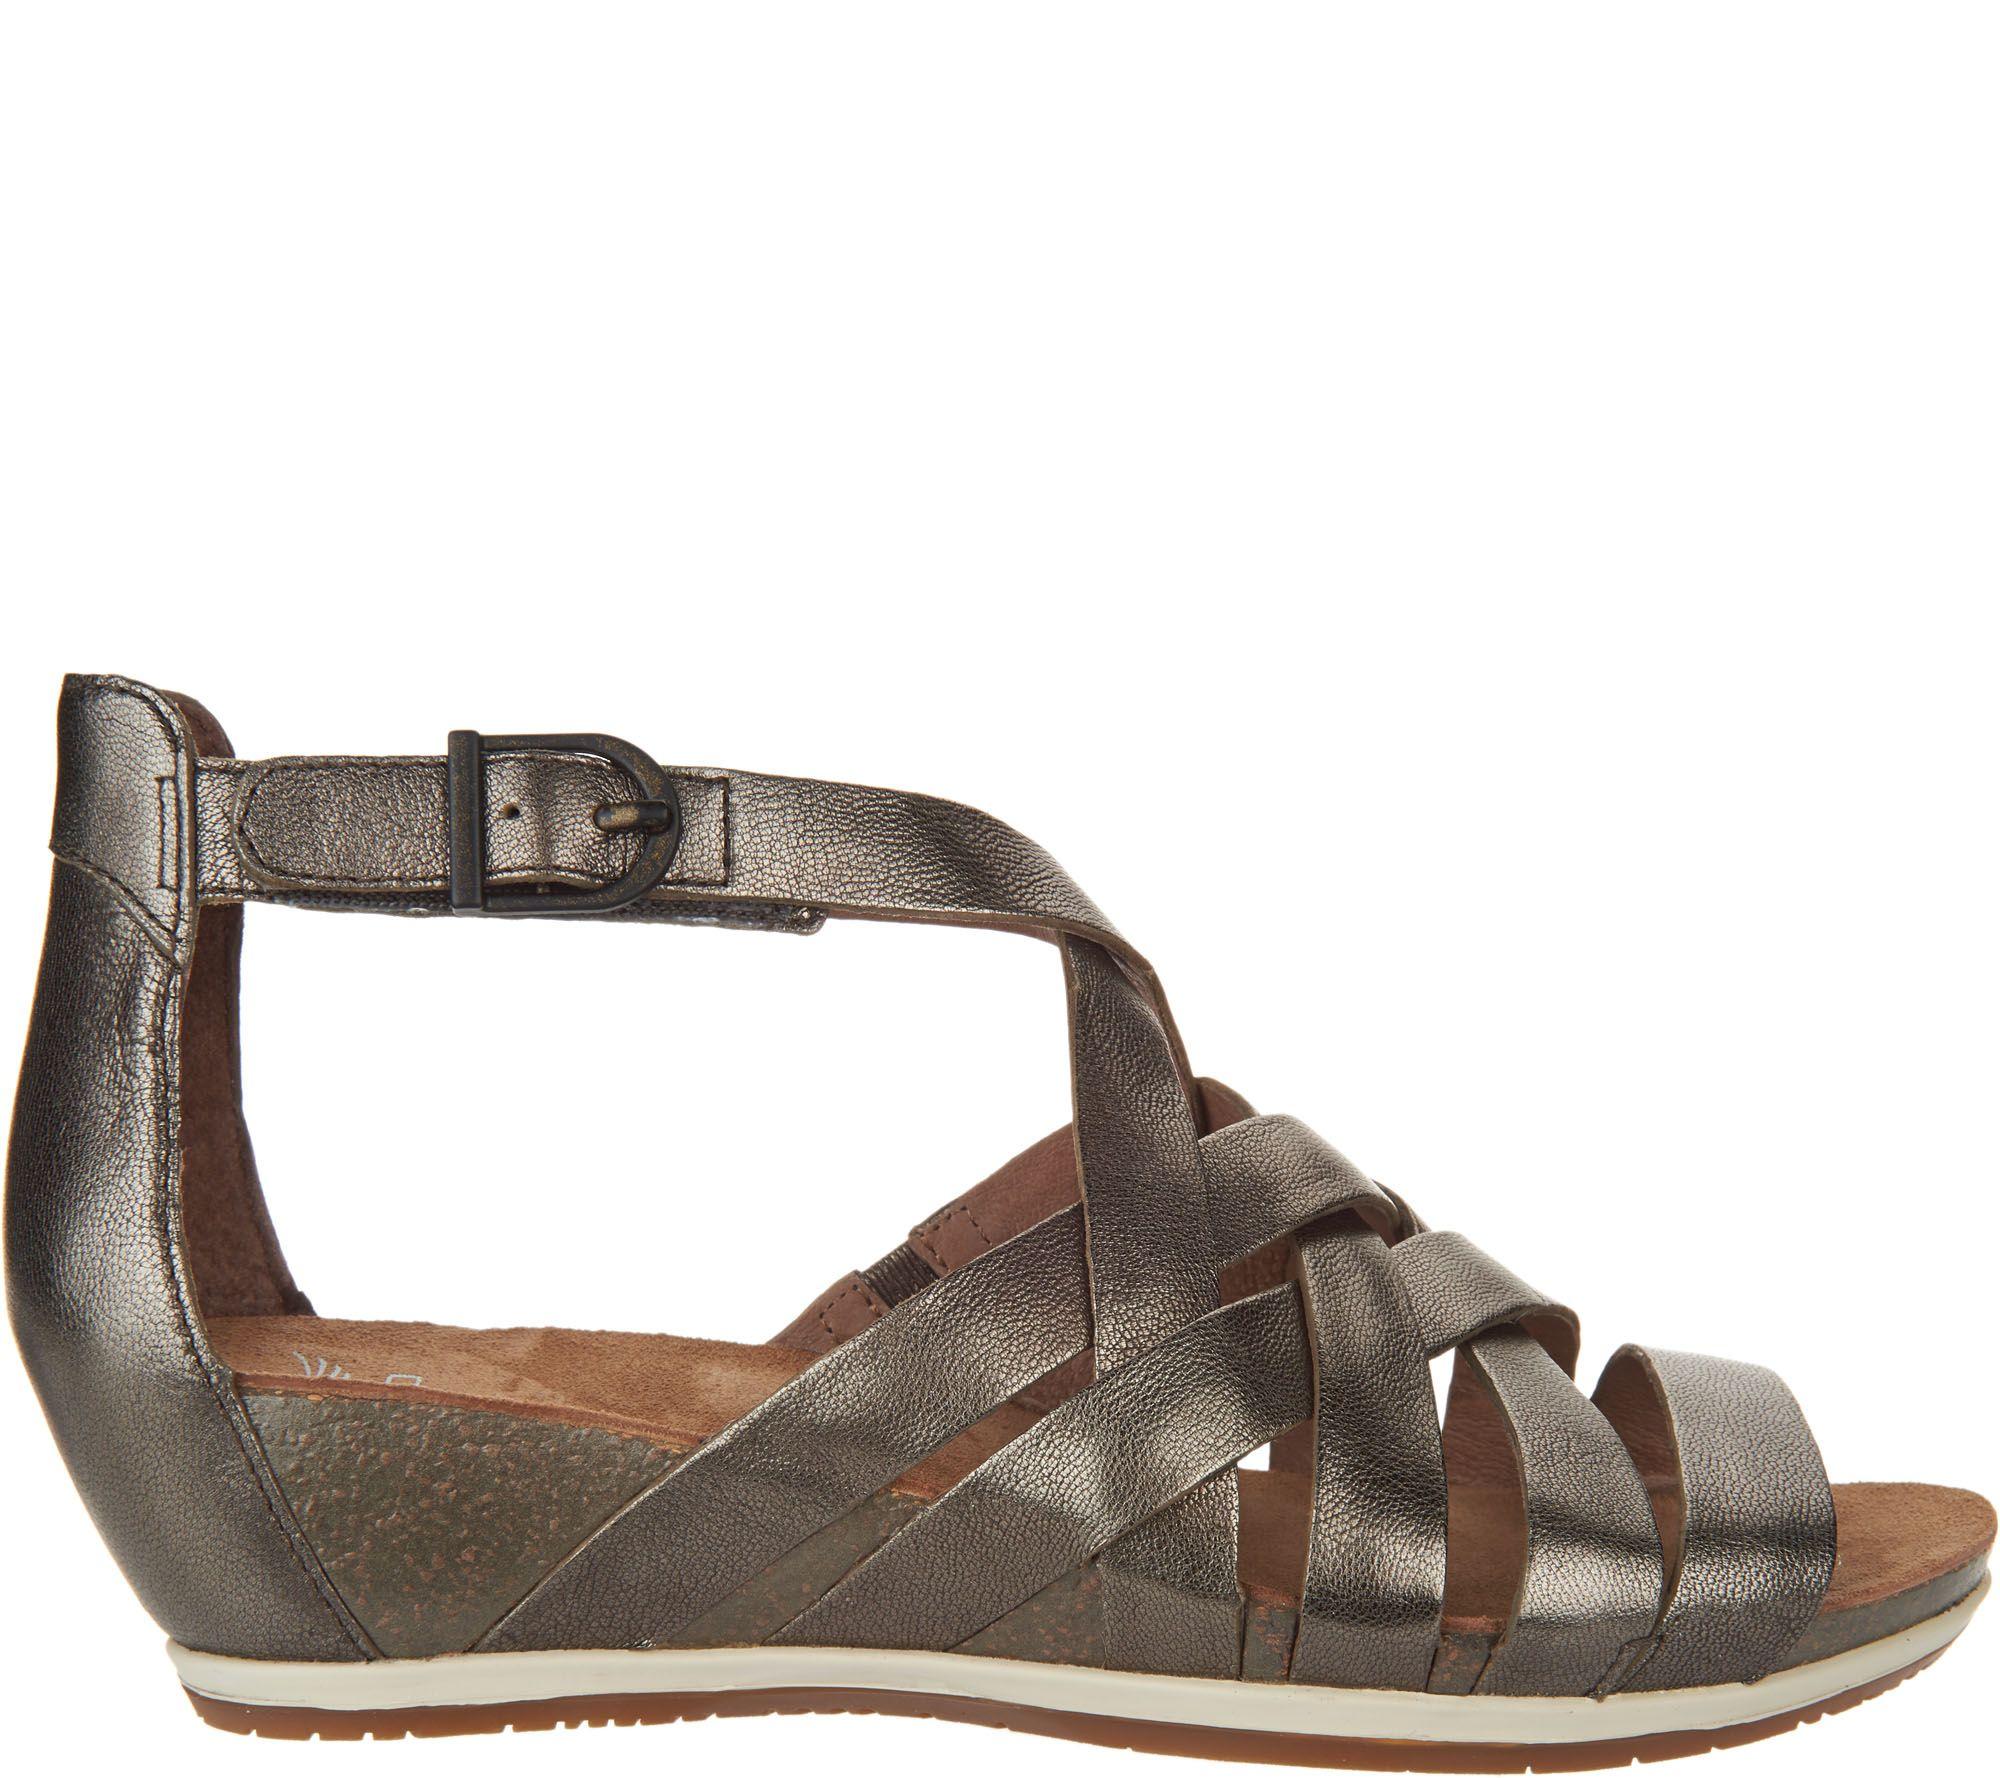 Multi Strap — Dansko Leather Vivian Sandals Wedge 4qR35AjL